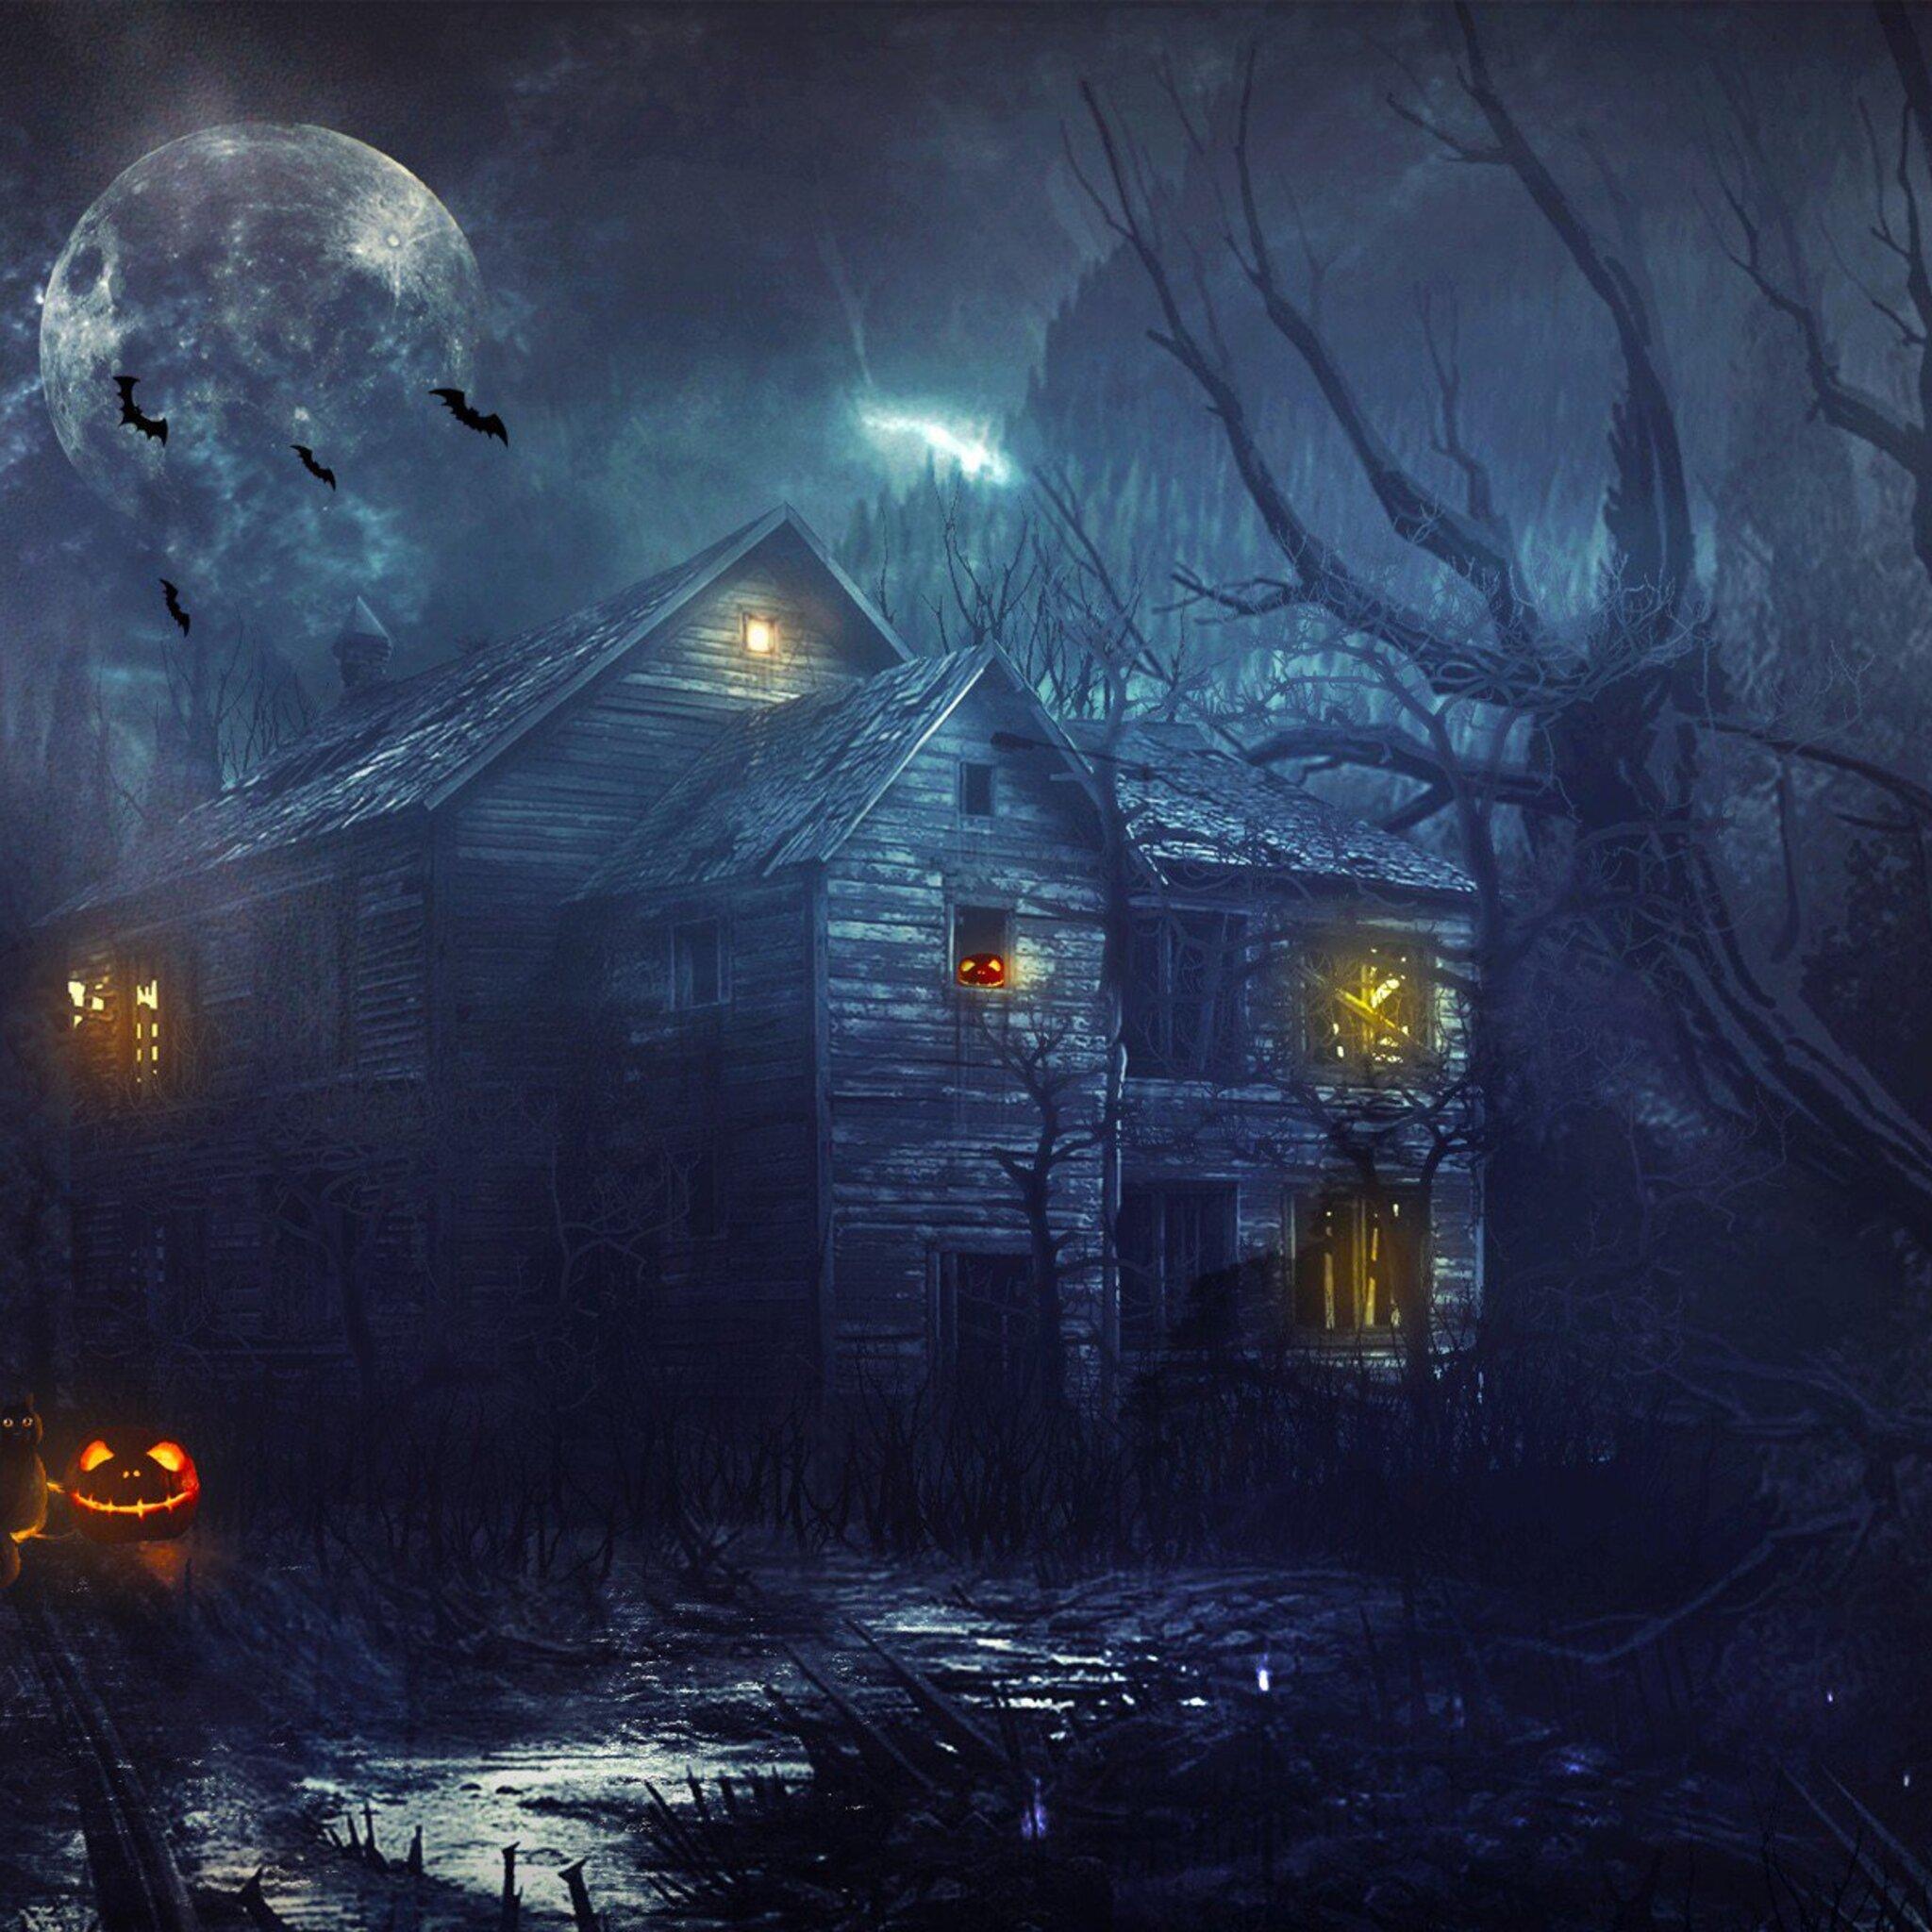 2048x2048 2016 Halloween Ipad Air HD 4k Wallpapers, Images